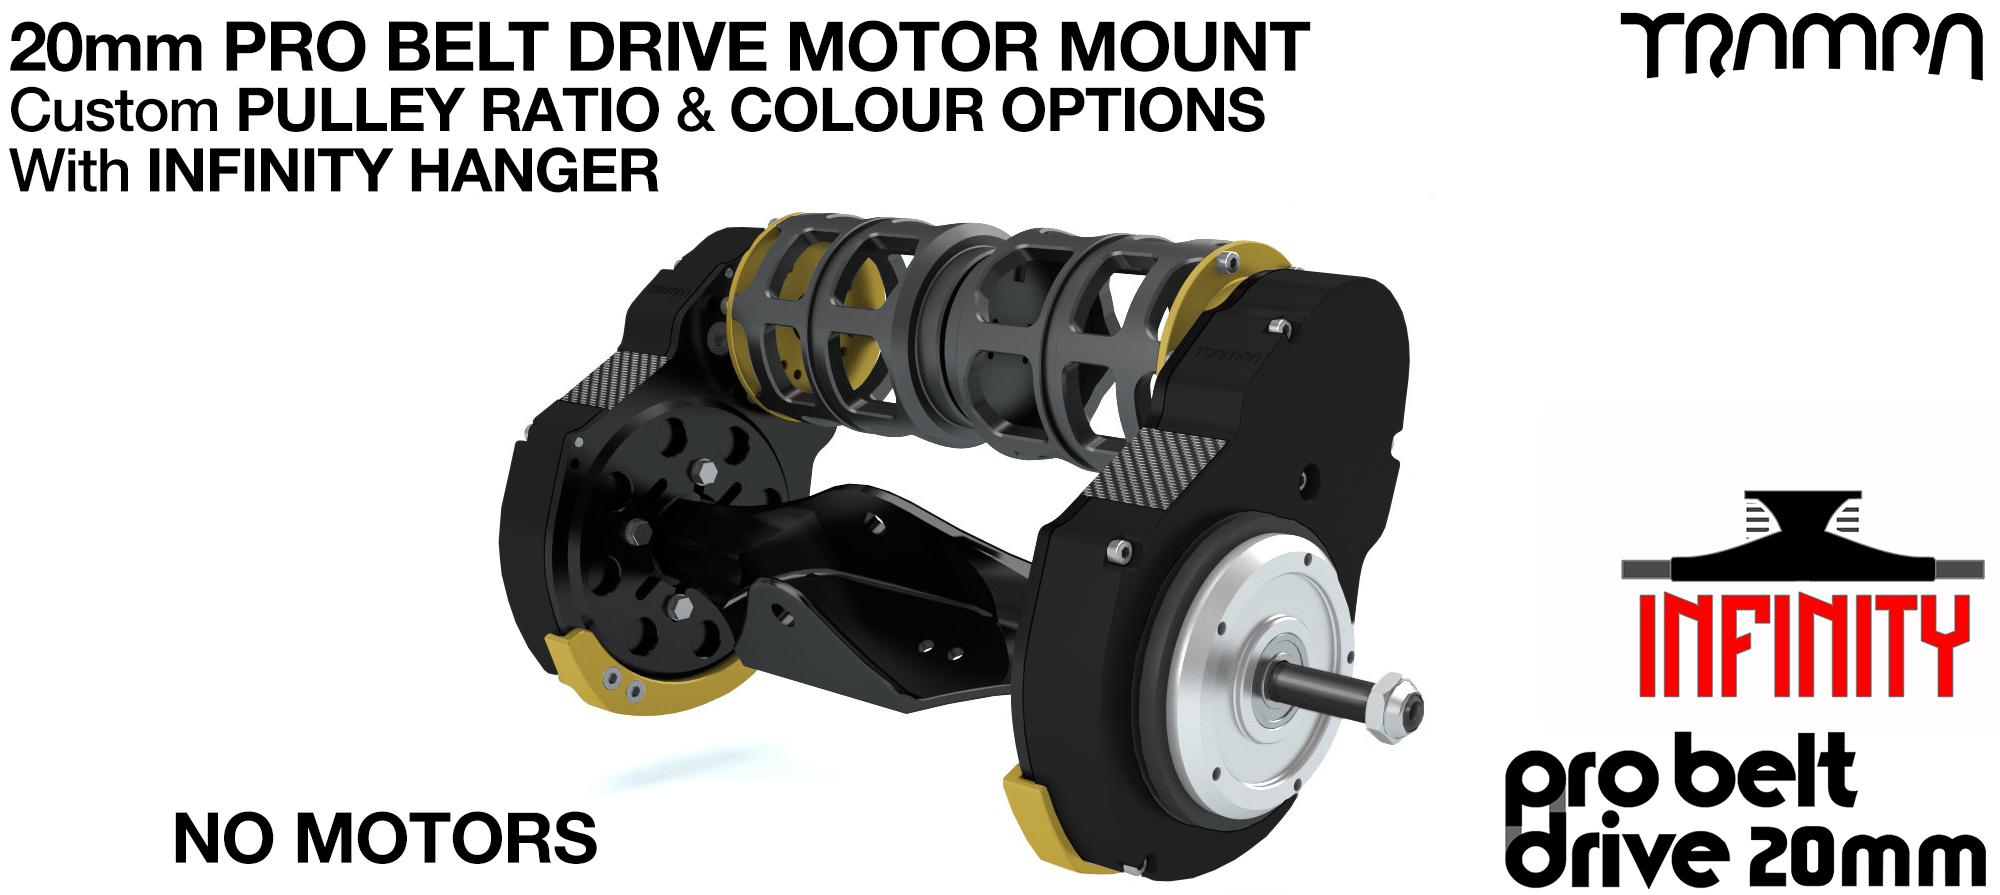 20mm  PRO Belt Drive TWIN Motor Mountainboard & Precision INFINITY Hanger - NO MOTORS